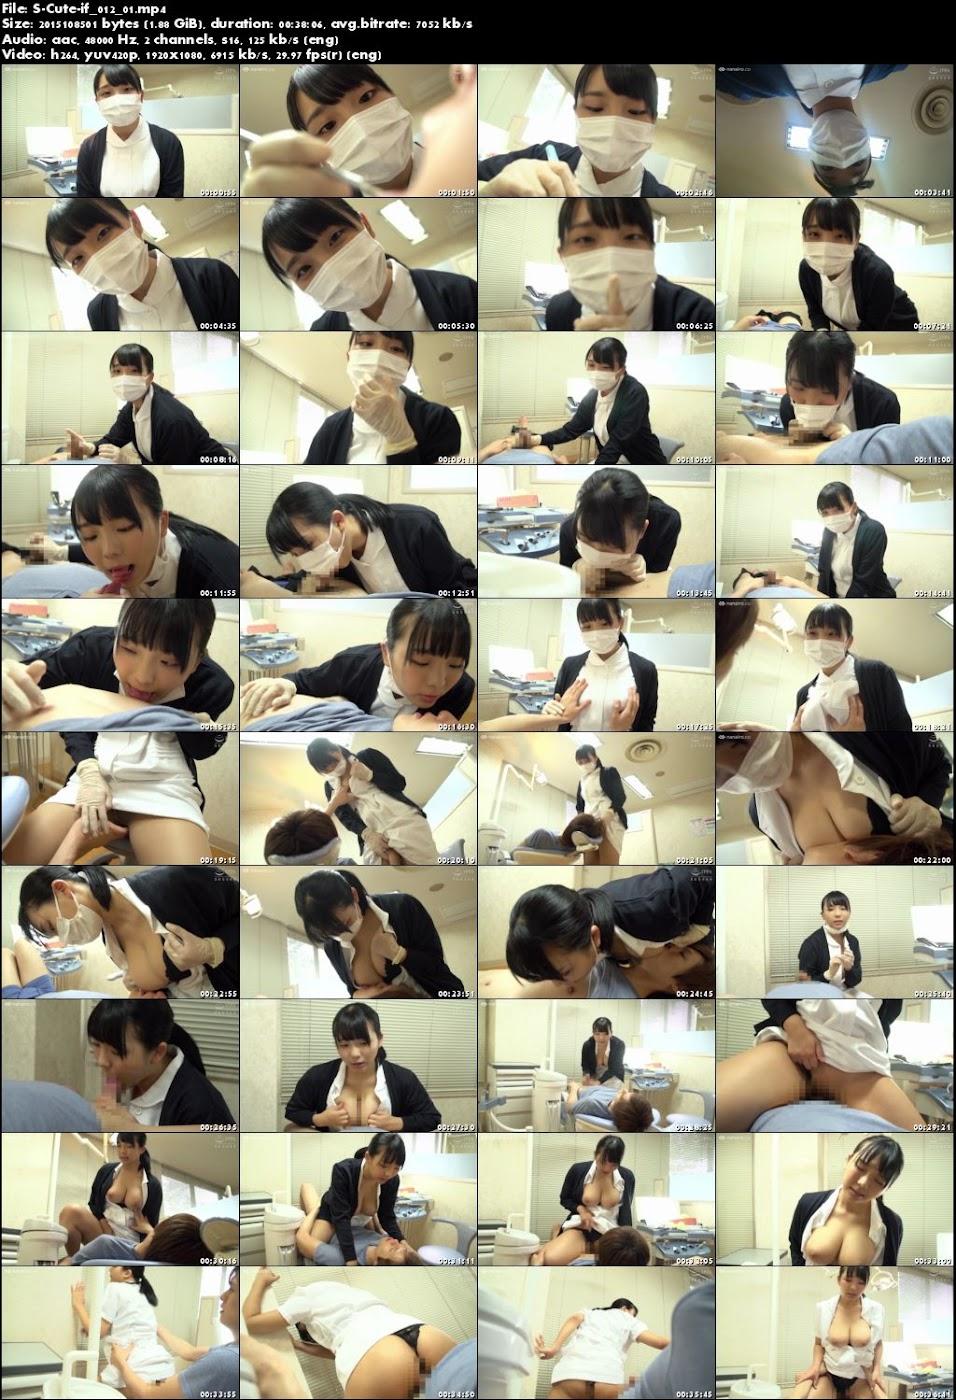 S-Cute if_012_01 もし歯医者で内緒でエッチができたら/Ruka jav av image download